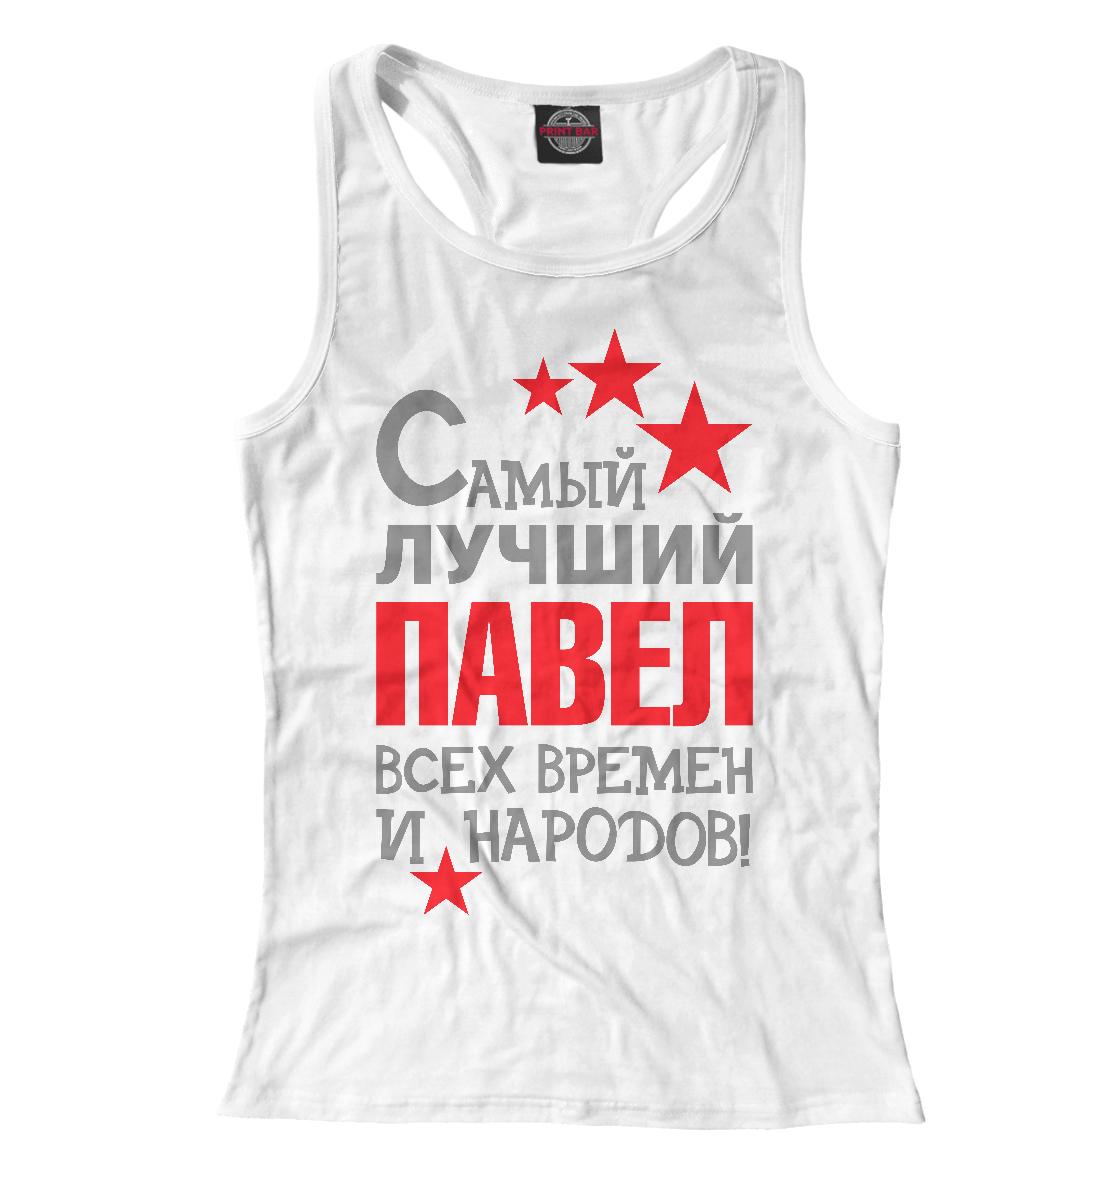 Купить Павел, Printbar, Майки борцовки, IMR-777245-mayb-1